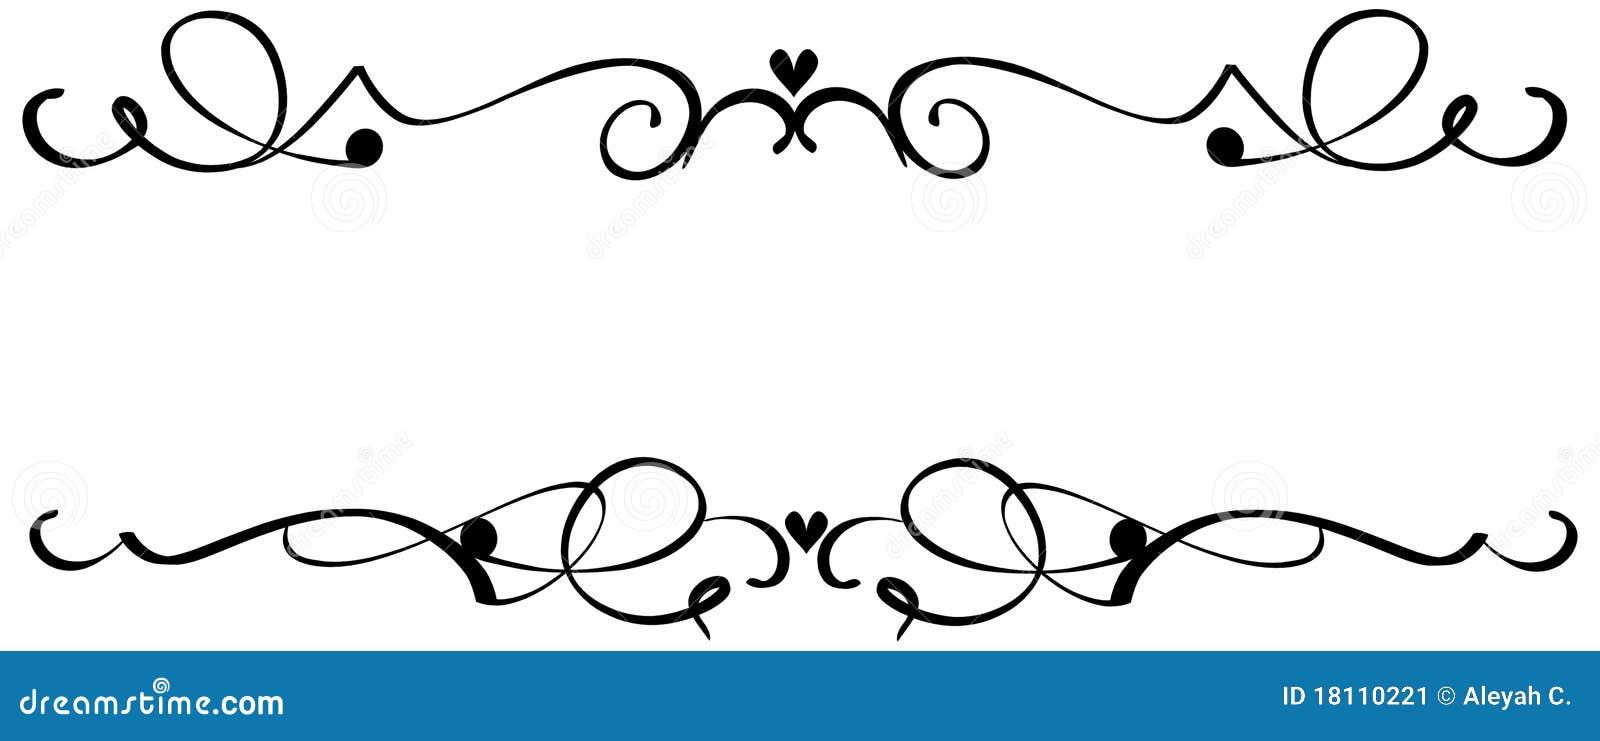 Line Art Design Kft : Rolle inner verzierungen vektor abbildung illustration